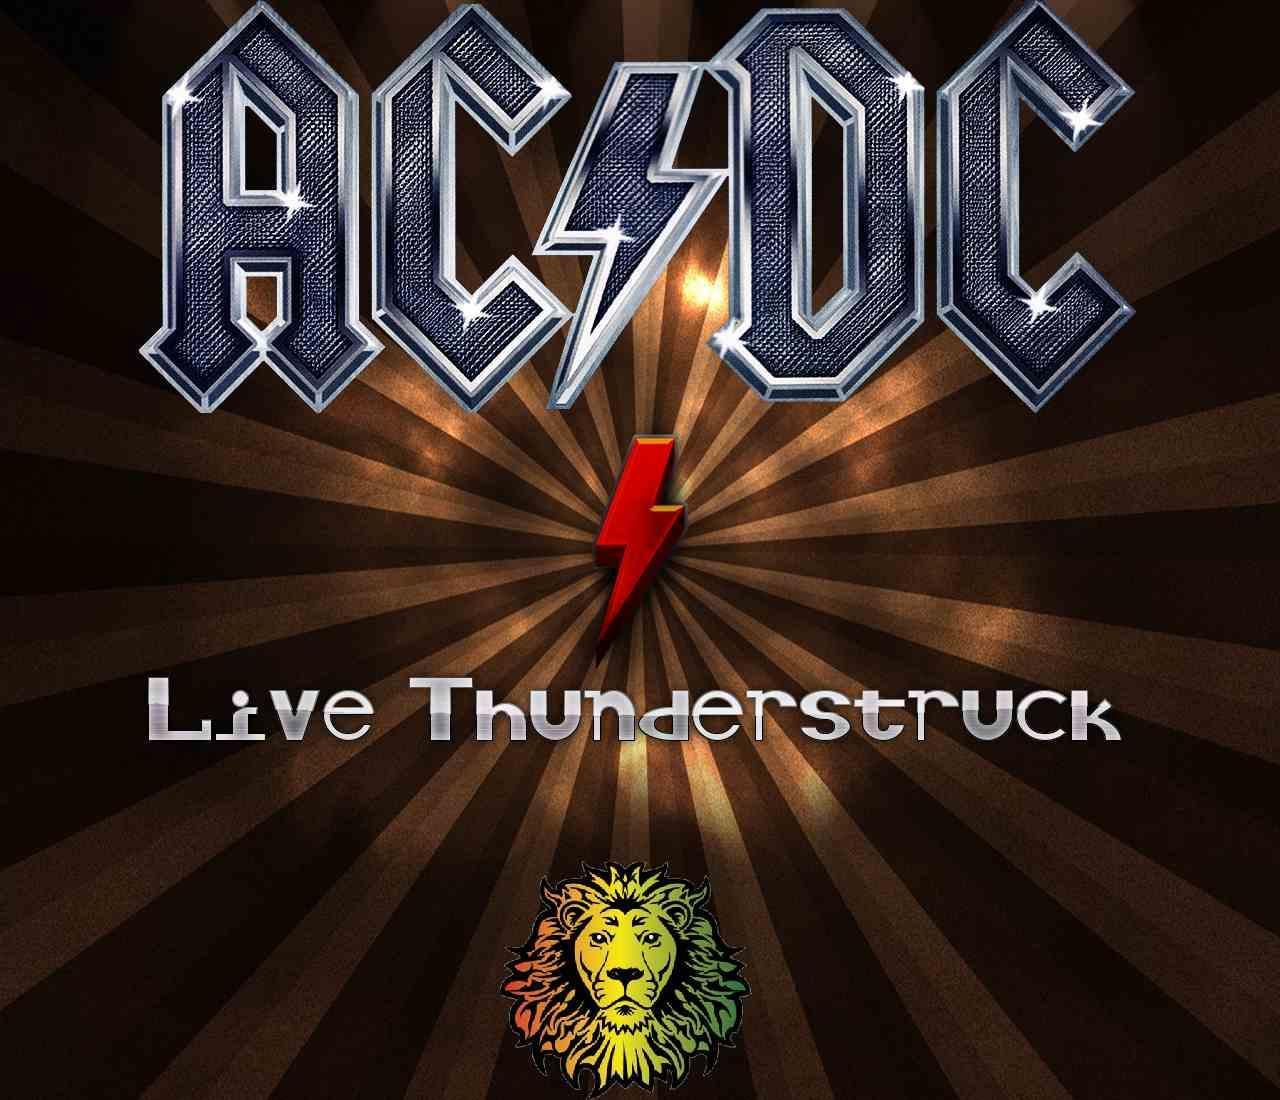 ac dc thunderstruck download mp3